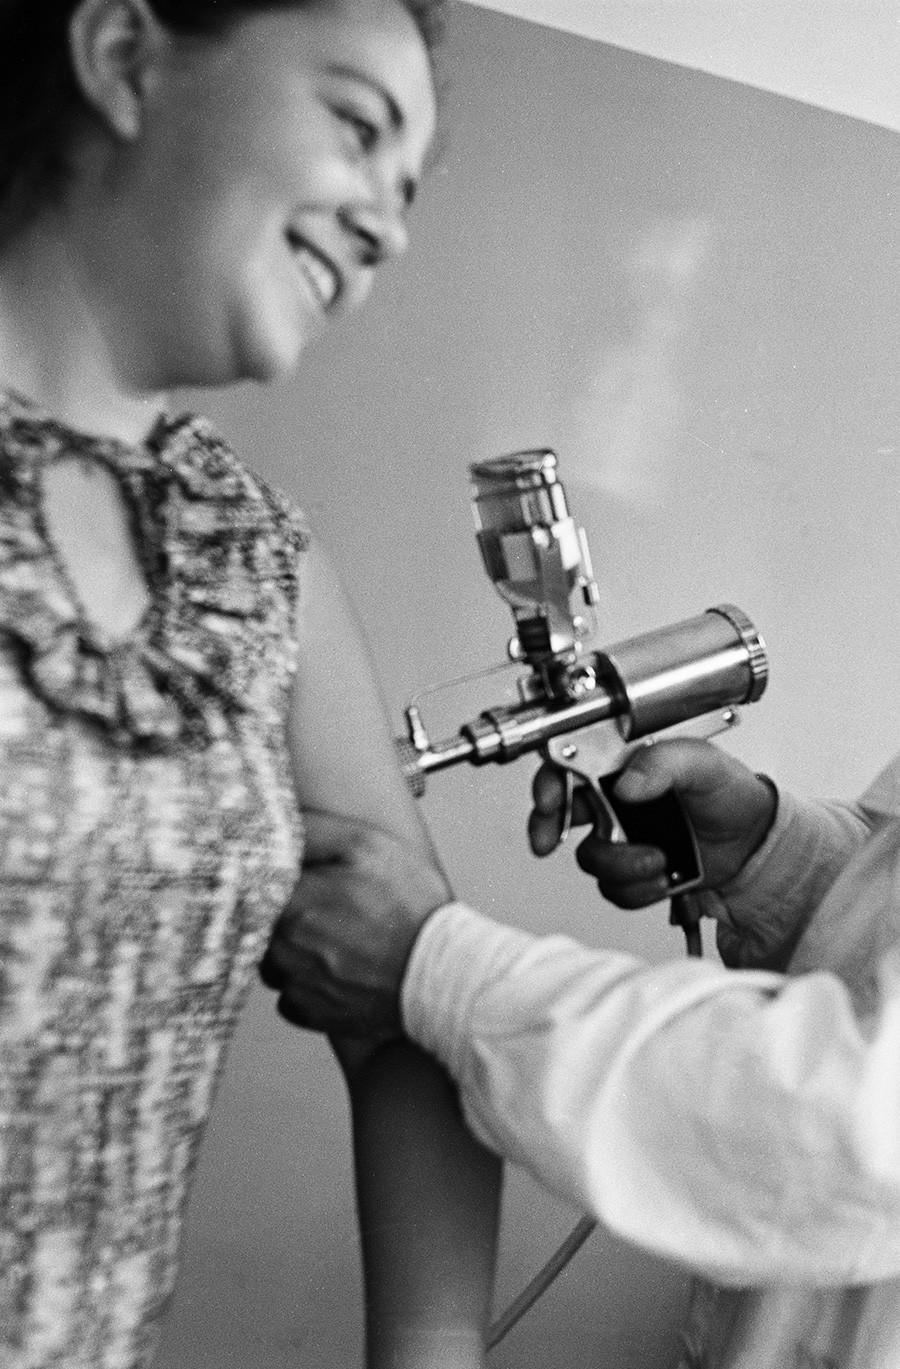 Cijepljenje, Moskva, SSSR, 1. rujna 1969.